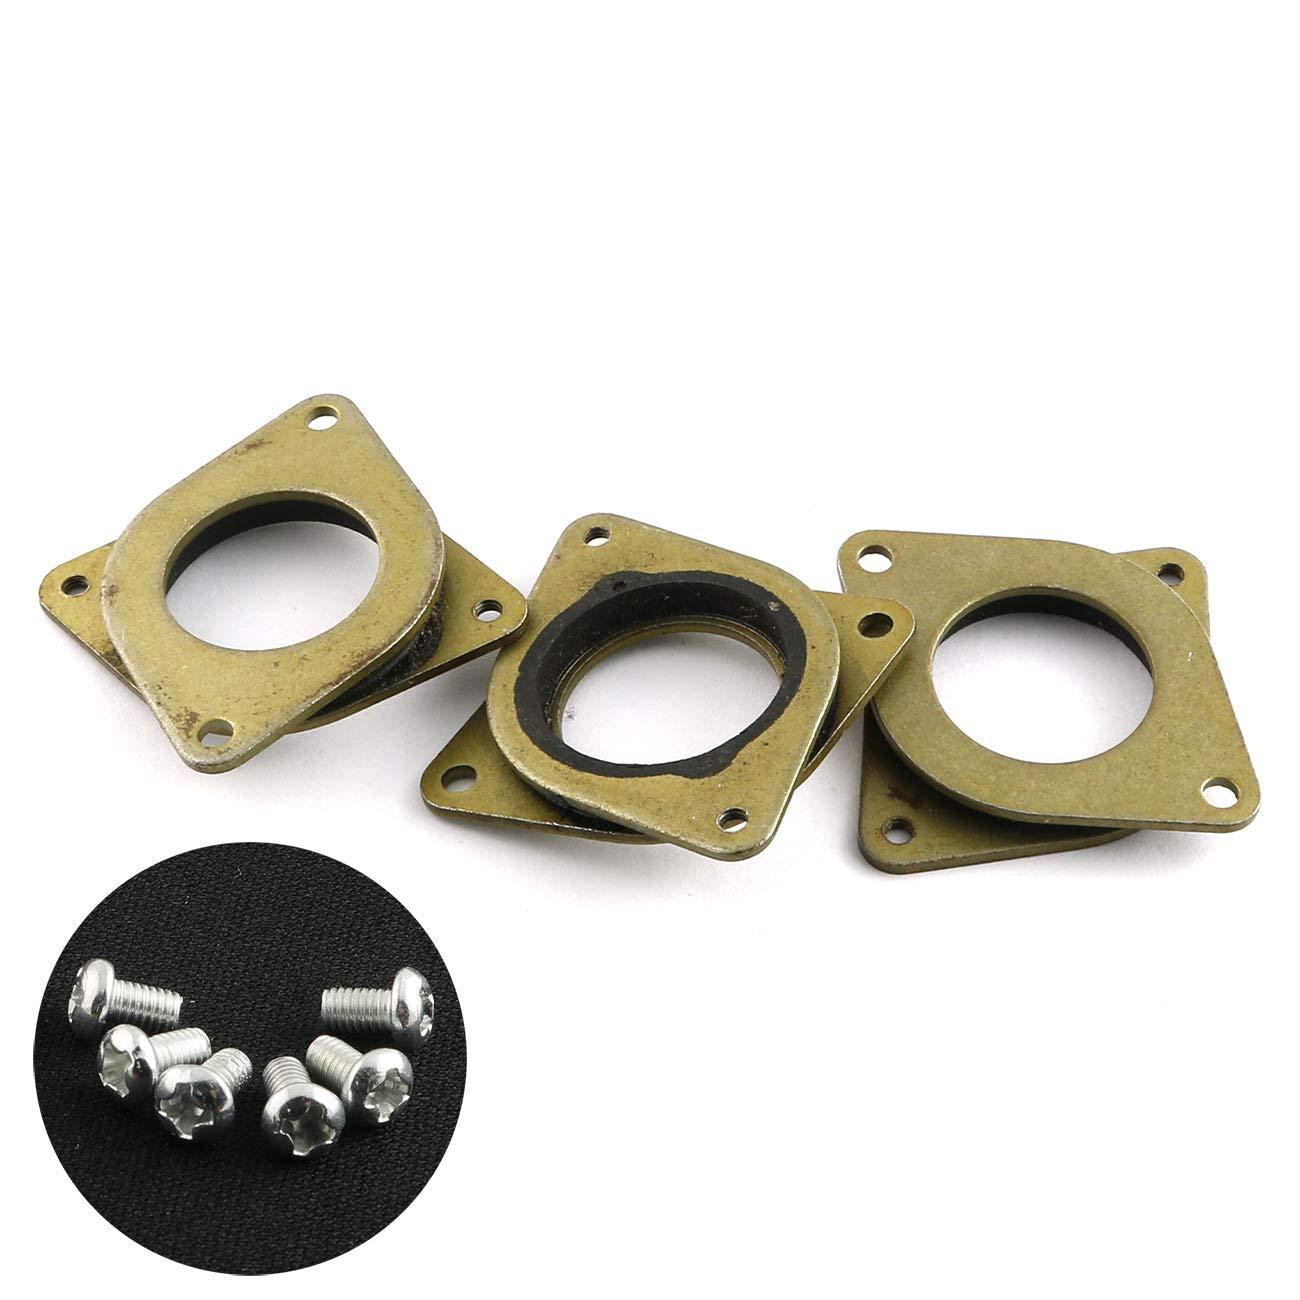 5pcs Shock Absorber Stepper Motor Vibration Damper for 3D Printer Nema17 Stepper